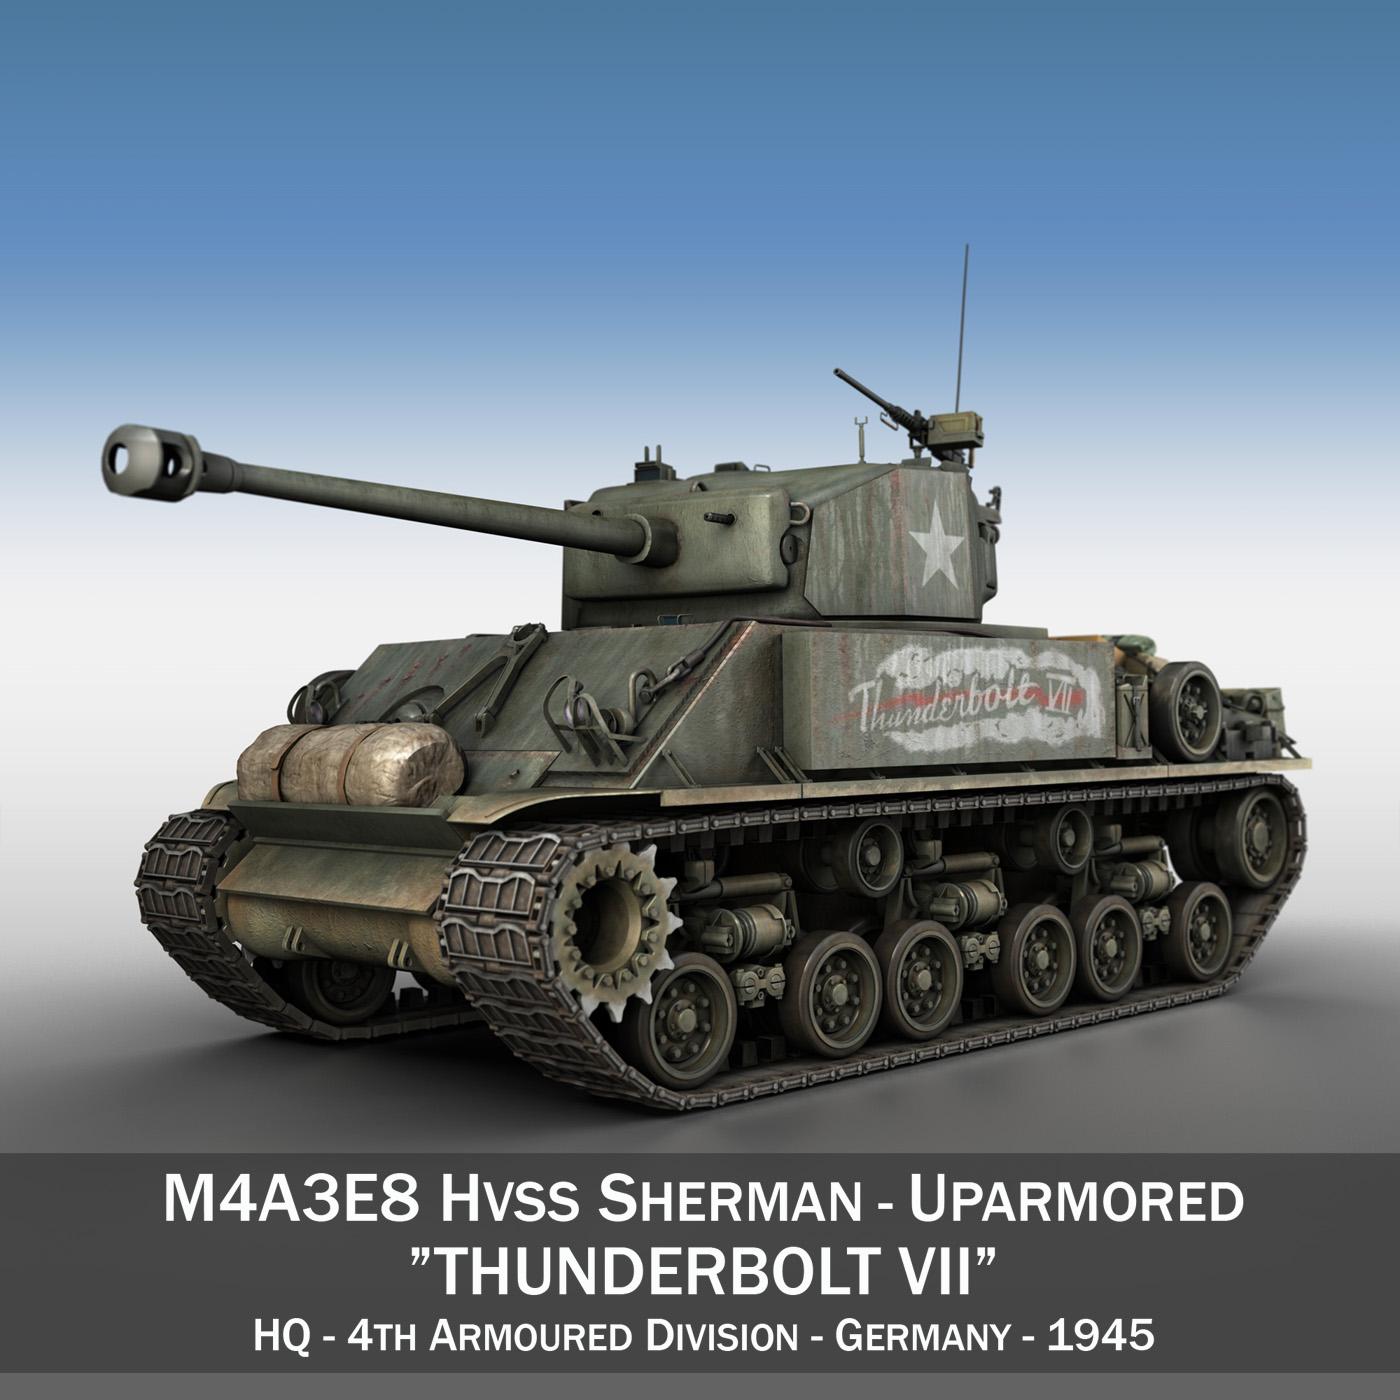 m4a3e8 hvss sherman – thunderbolt vii 3d model 3ds fbx c4d lwo obj 196834